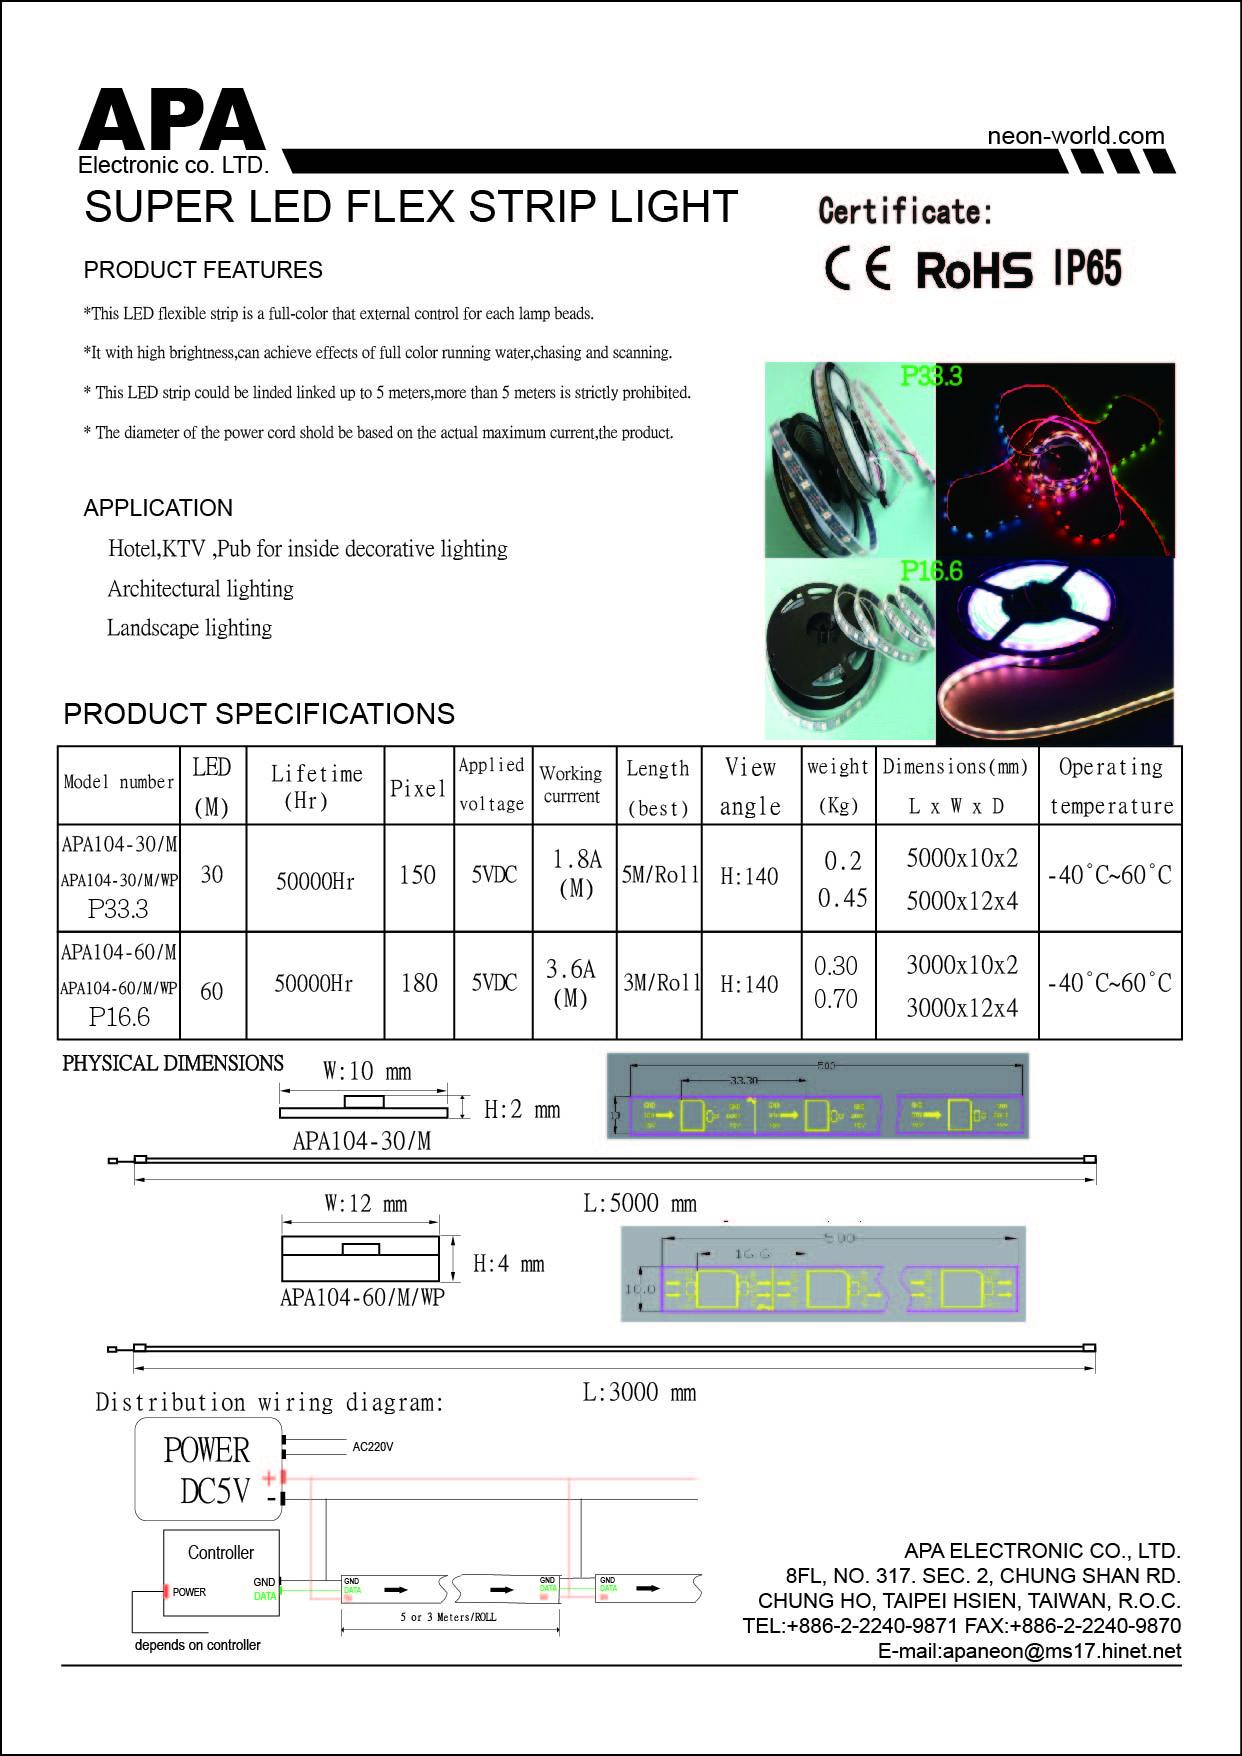 ni:apa104-30_60_m_flexstrip_p33.3_p16.6_spec_2013-2014.jpg